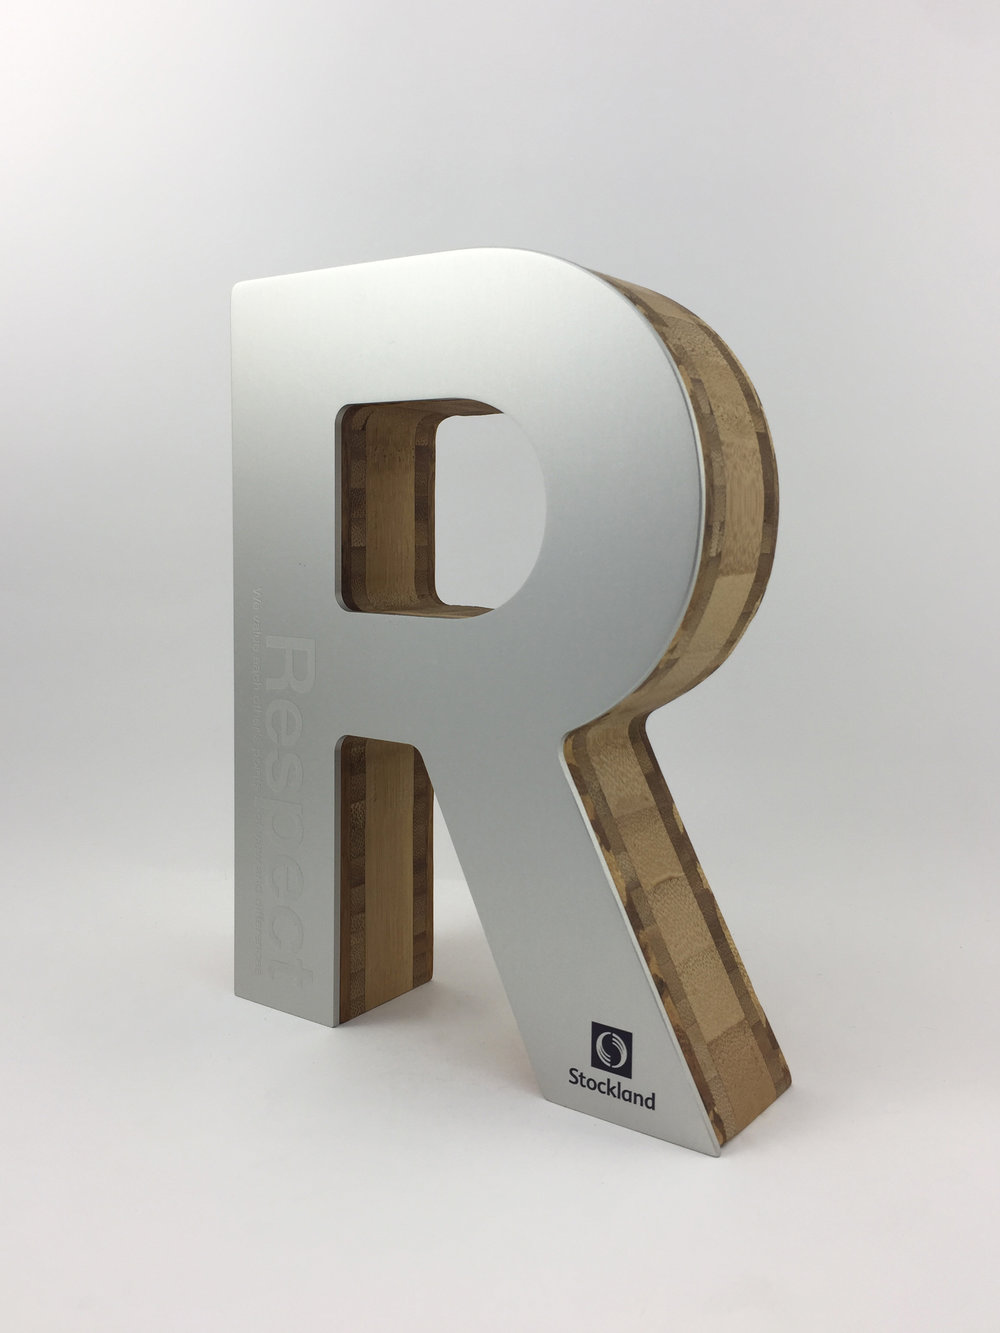 stockland-care-awards-eco-bamboo-plywood-timber-aluminium-trophy-04.jpg